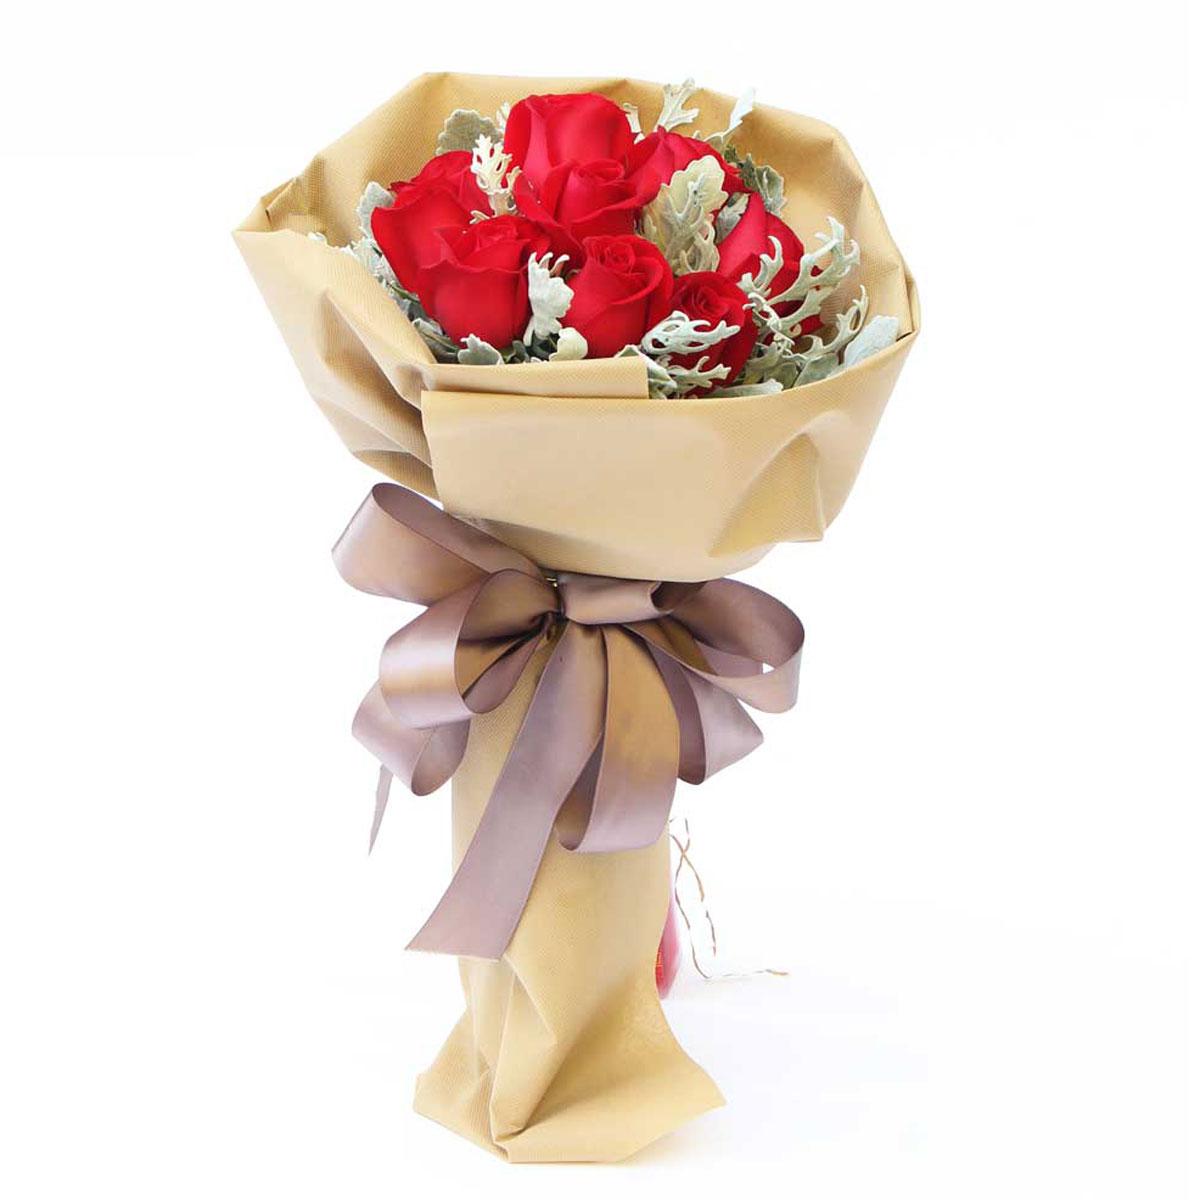 Flowers of Love | Hand Bouquet Flower | Eska Creative Gifting